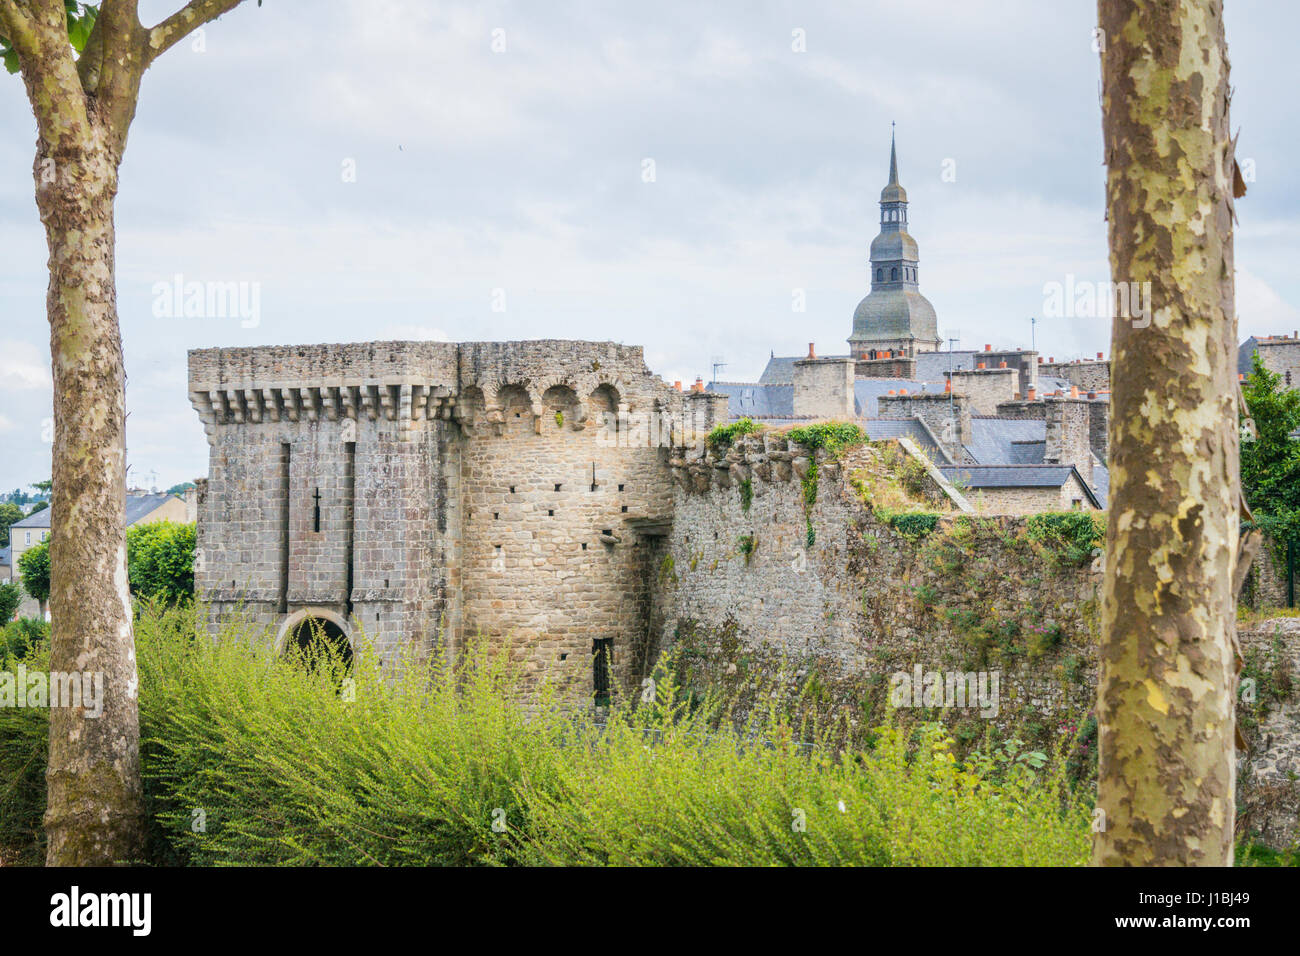 Jardin Anglais Basilique Saint Sauveur Dinan Brittany France